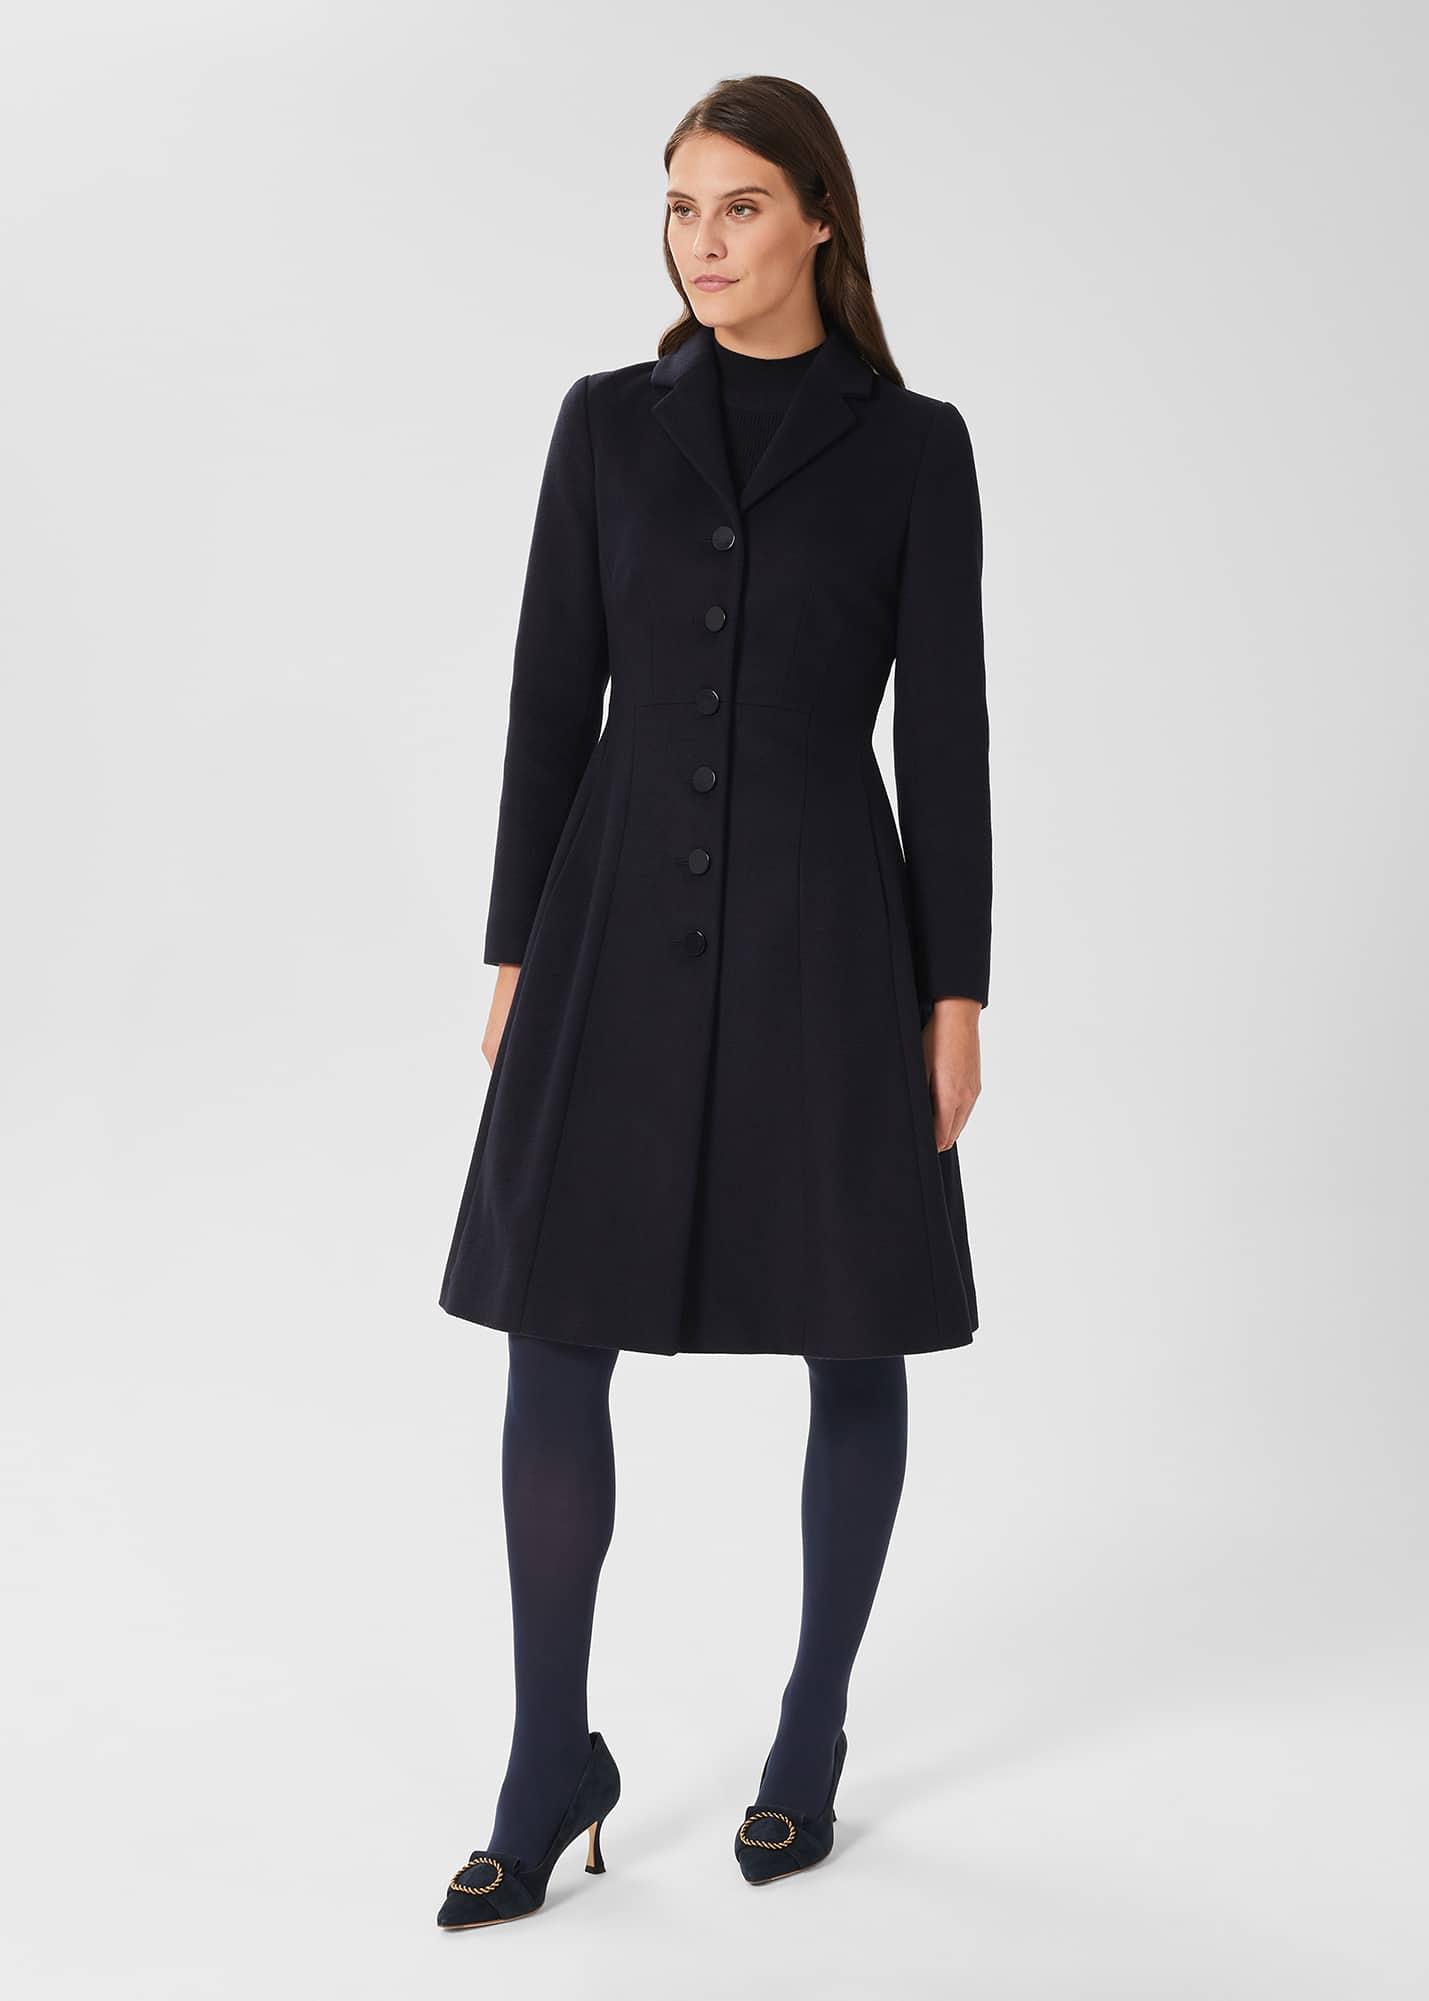 Hobbs Women Milly Wool Blend Coat